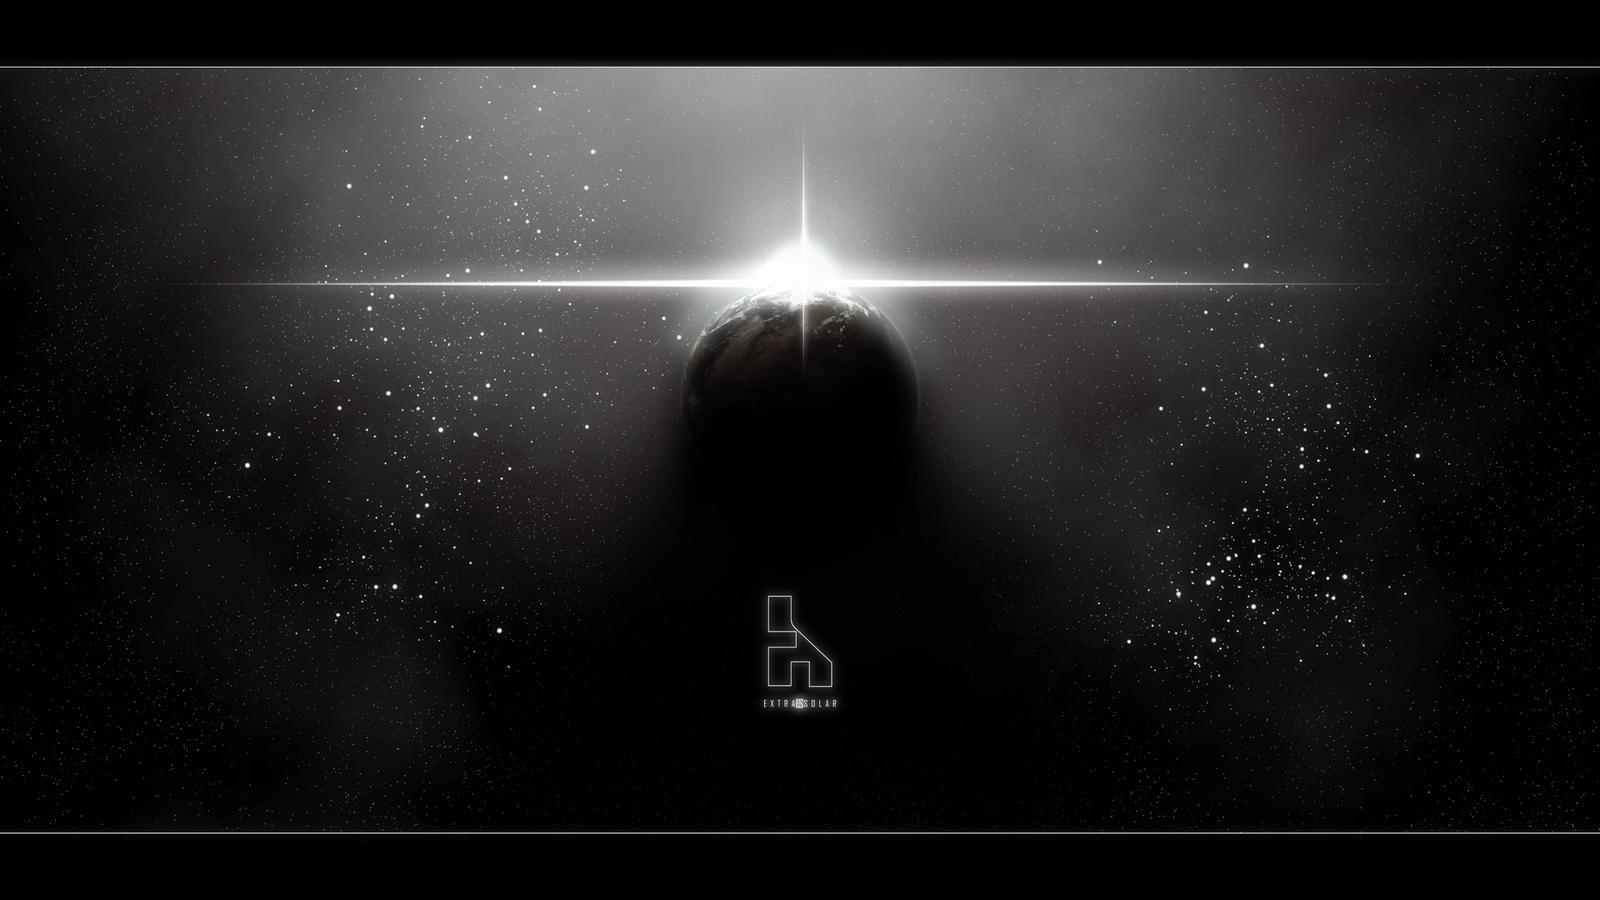 Extrasolar2011 by Ariel-X